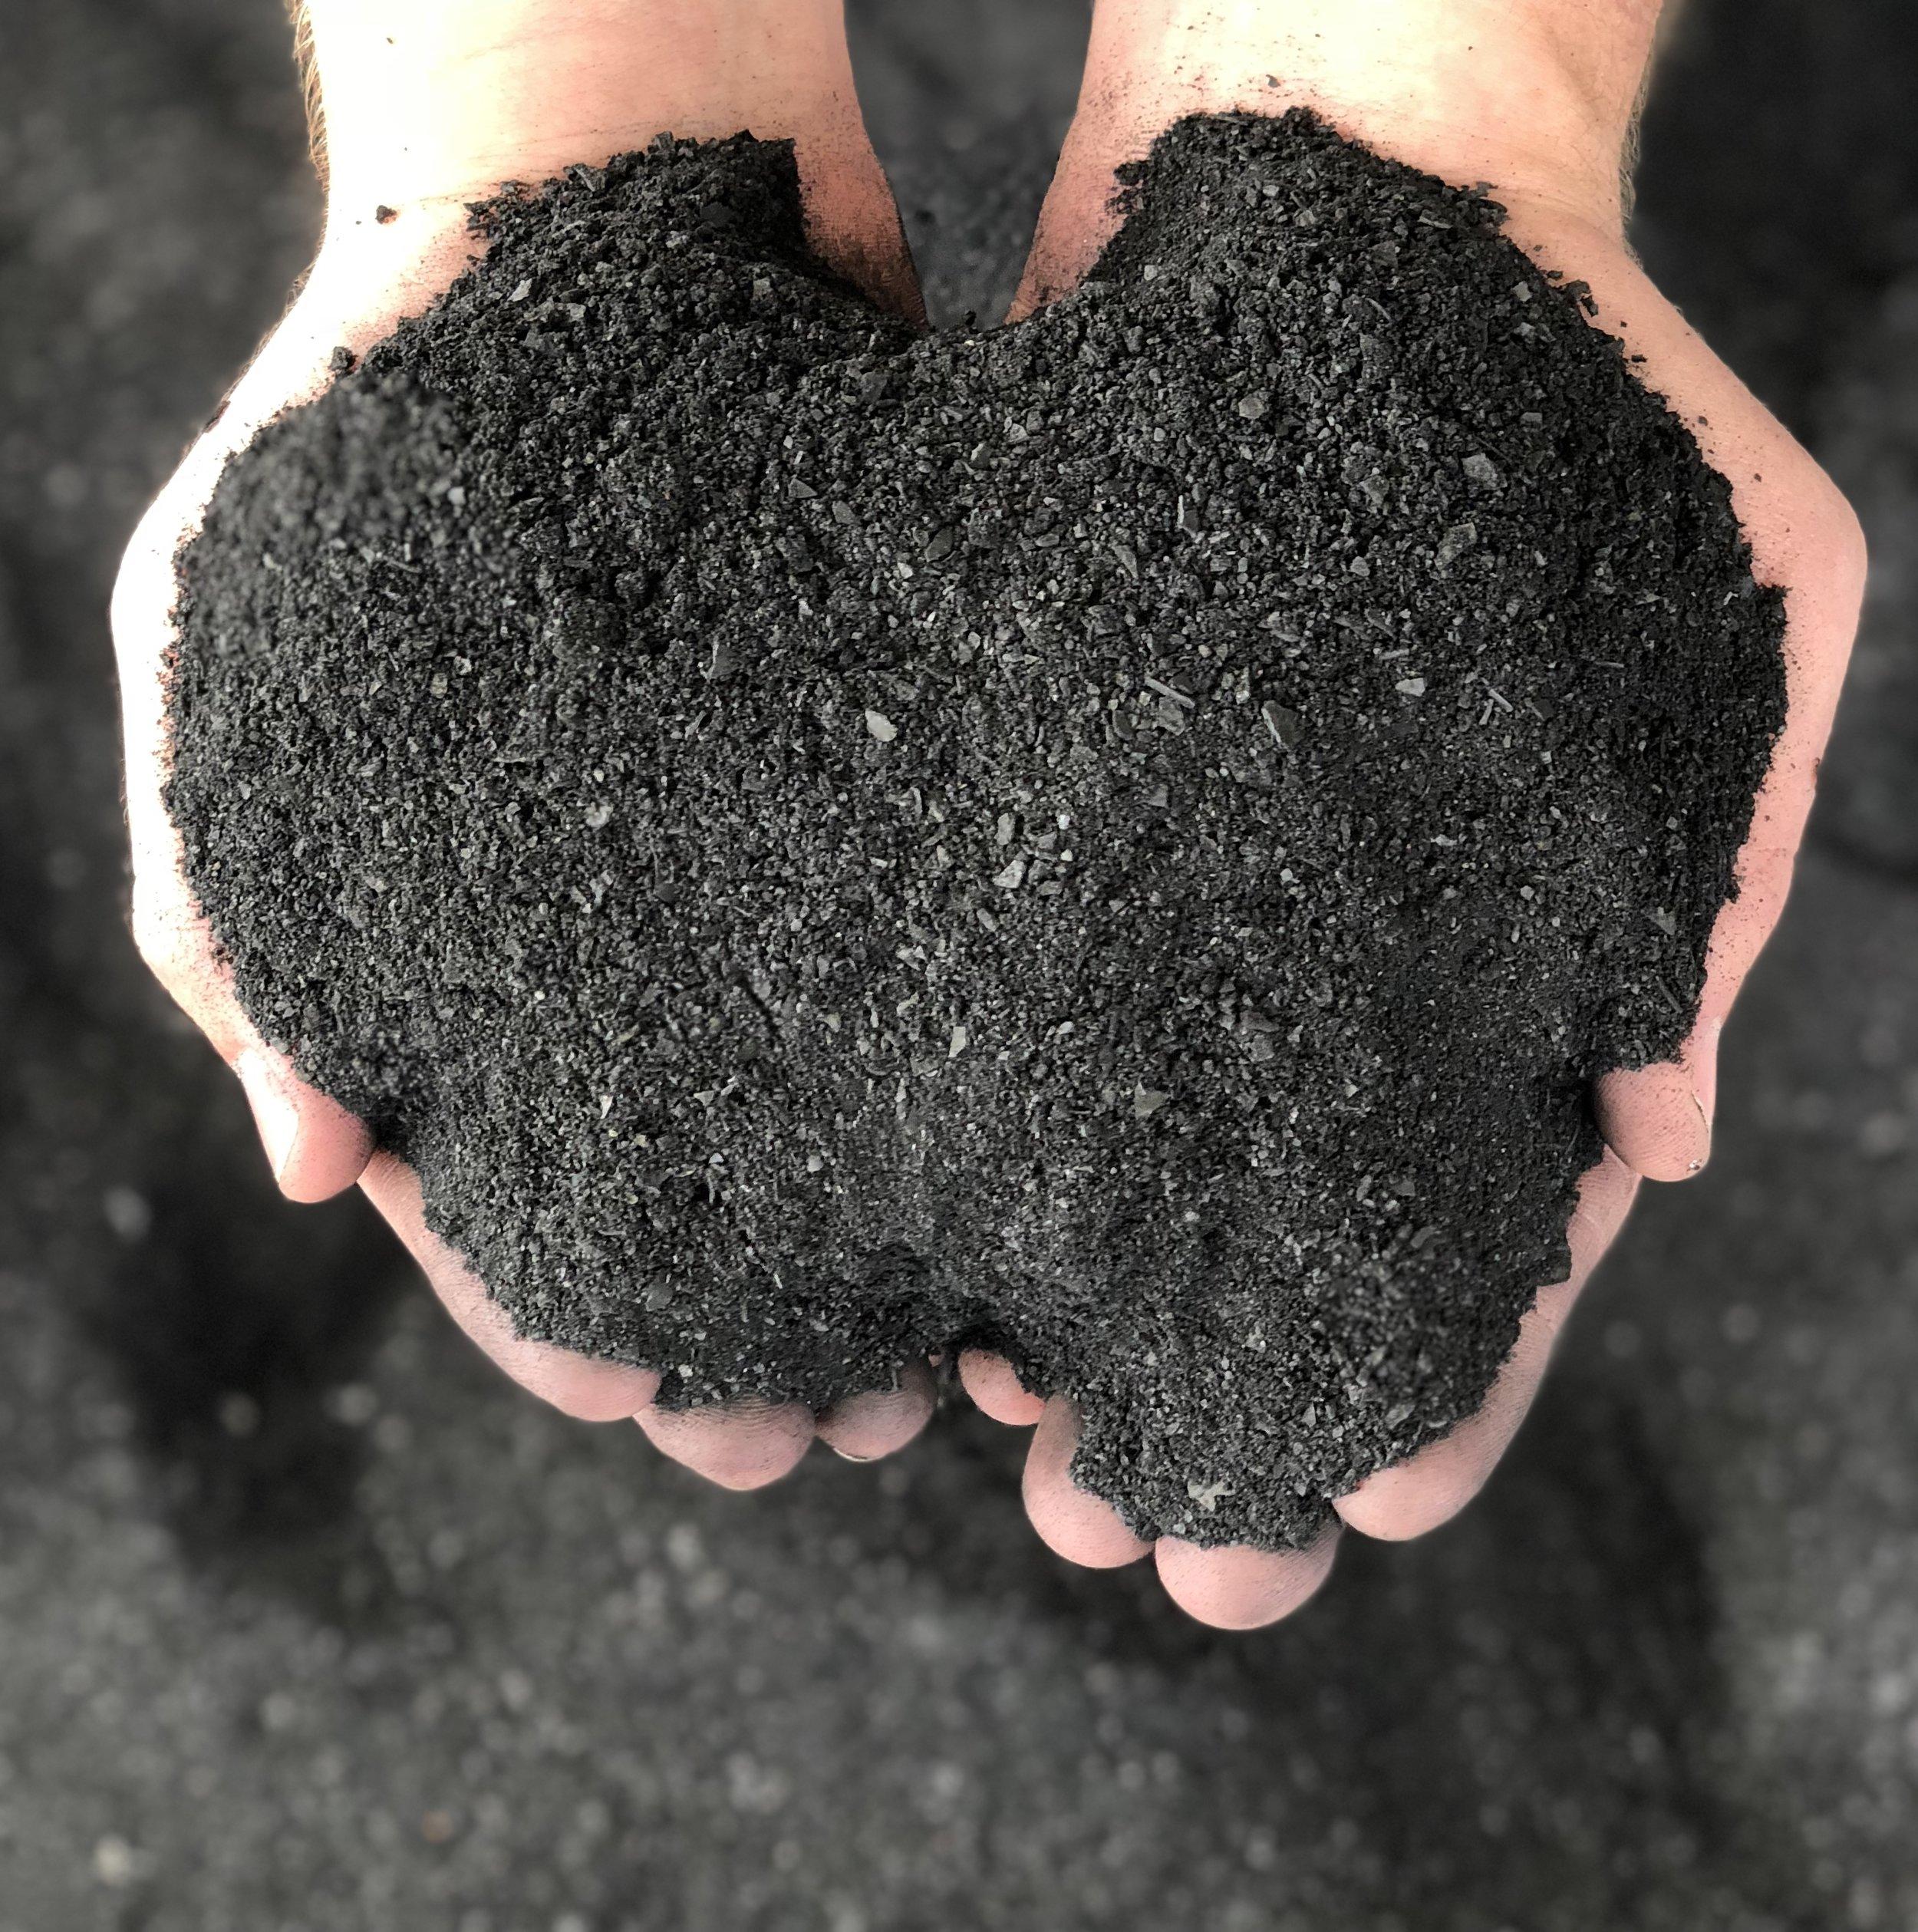 Carbonised nutshells after grinding